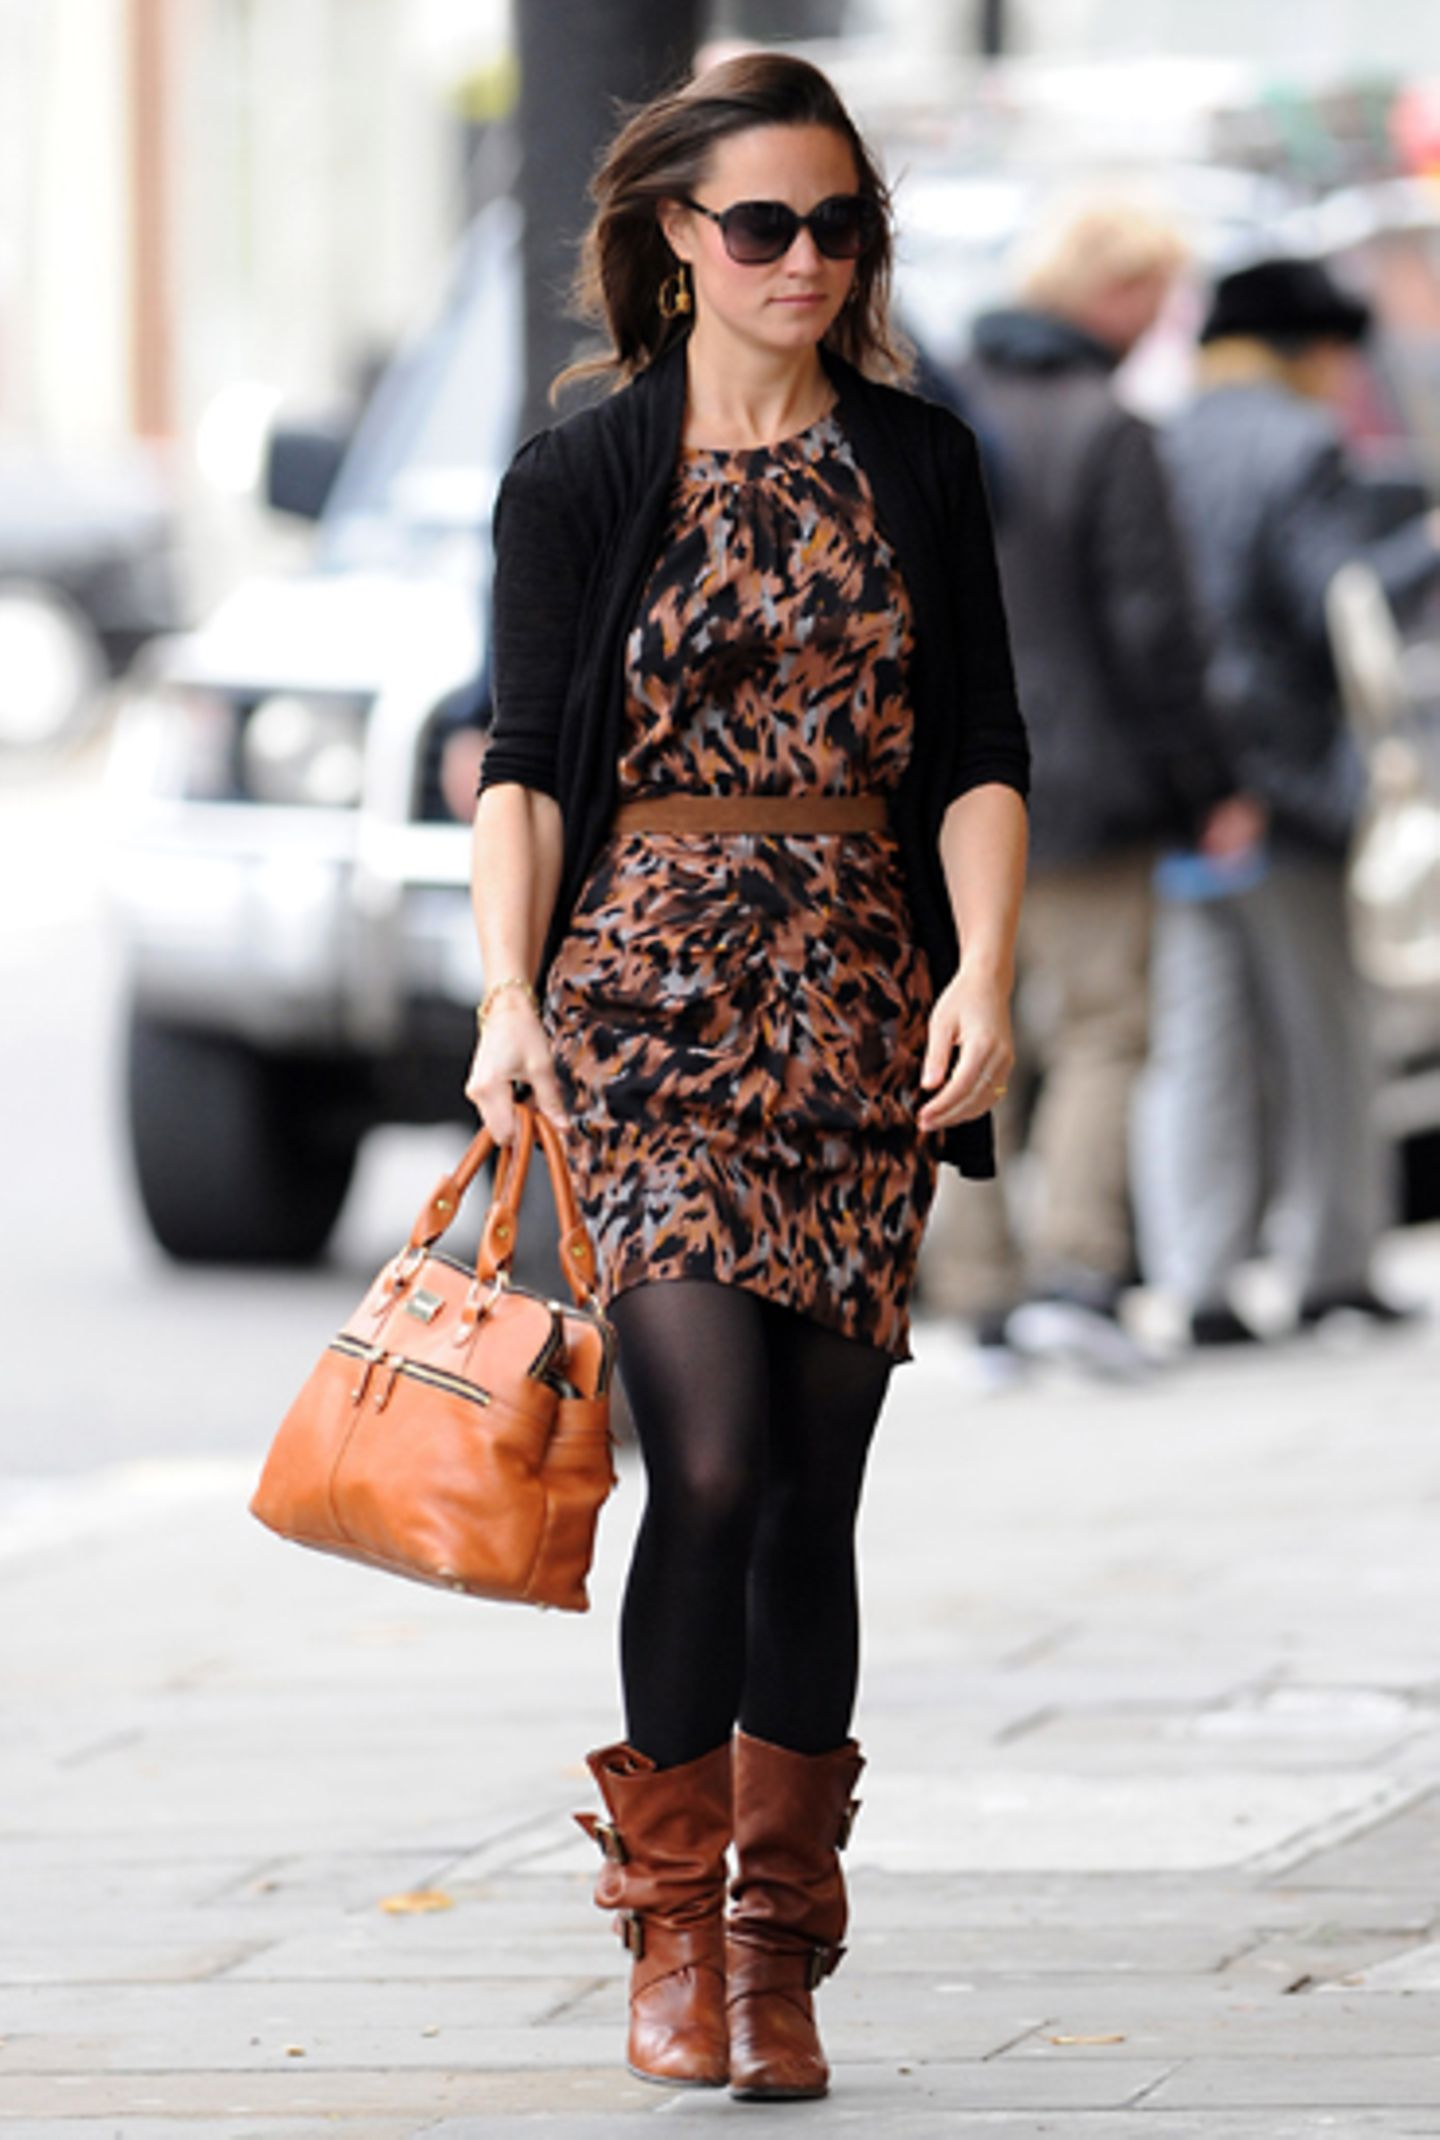 Print-Kleider - Pippa Middleton